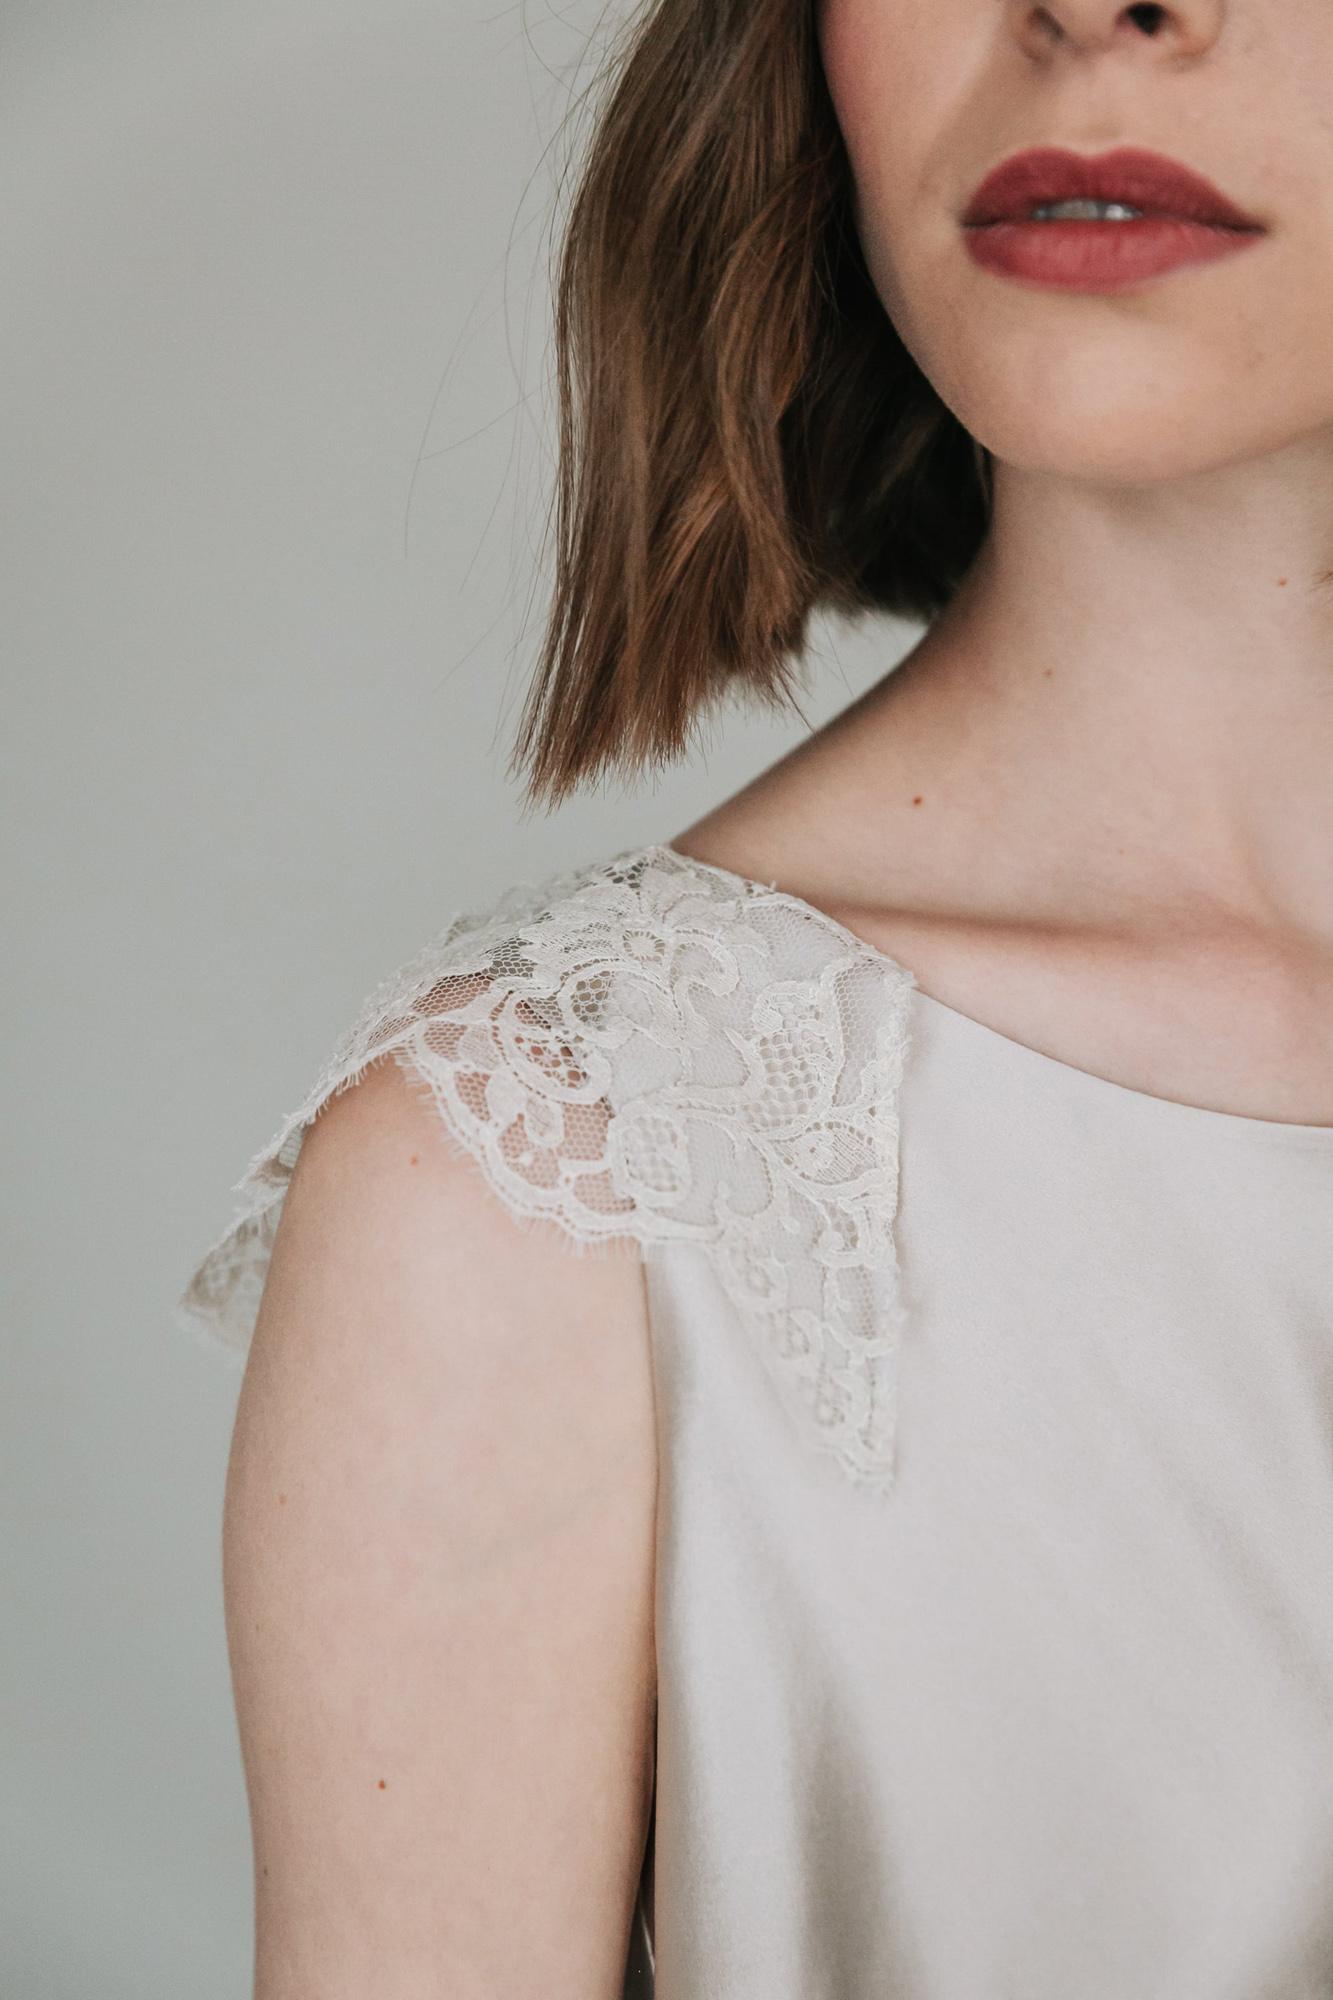 Kate-Beaumont-Sheffield-Honeysuckle-Bias-Cut-Silk-Panelled-Wedding-Gown-8.jpg